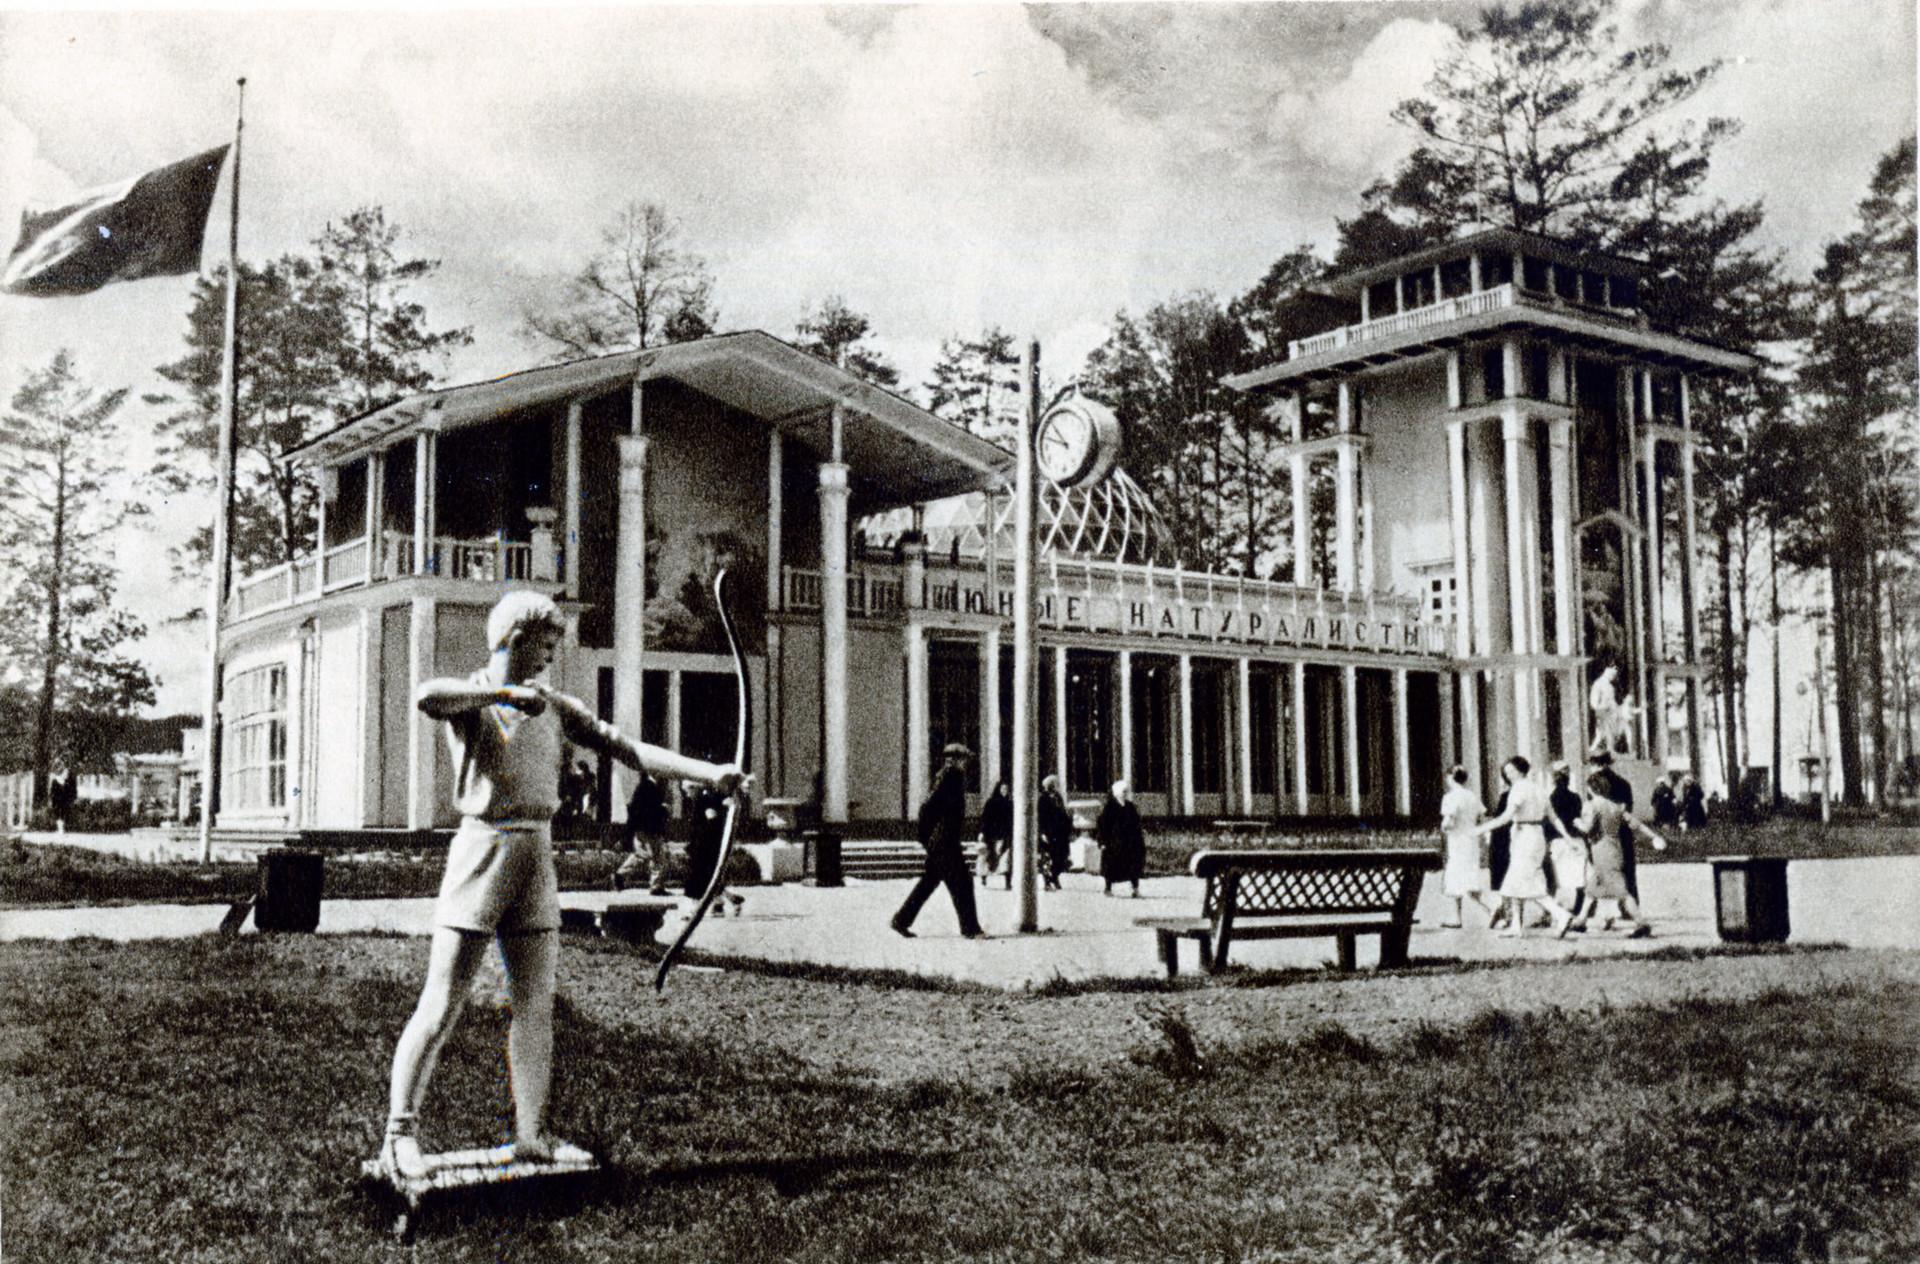 'Young Naturalists' pavilion